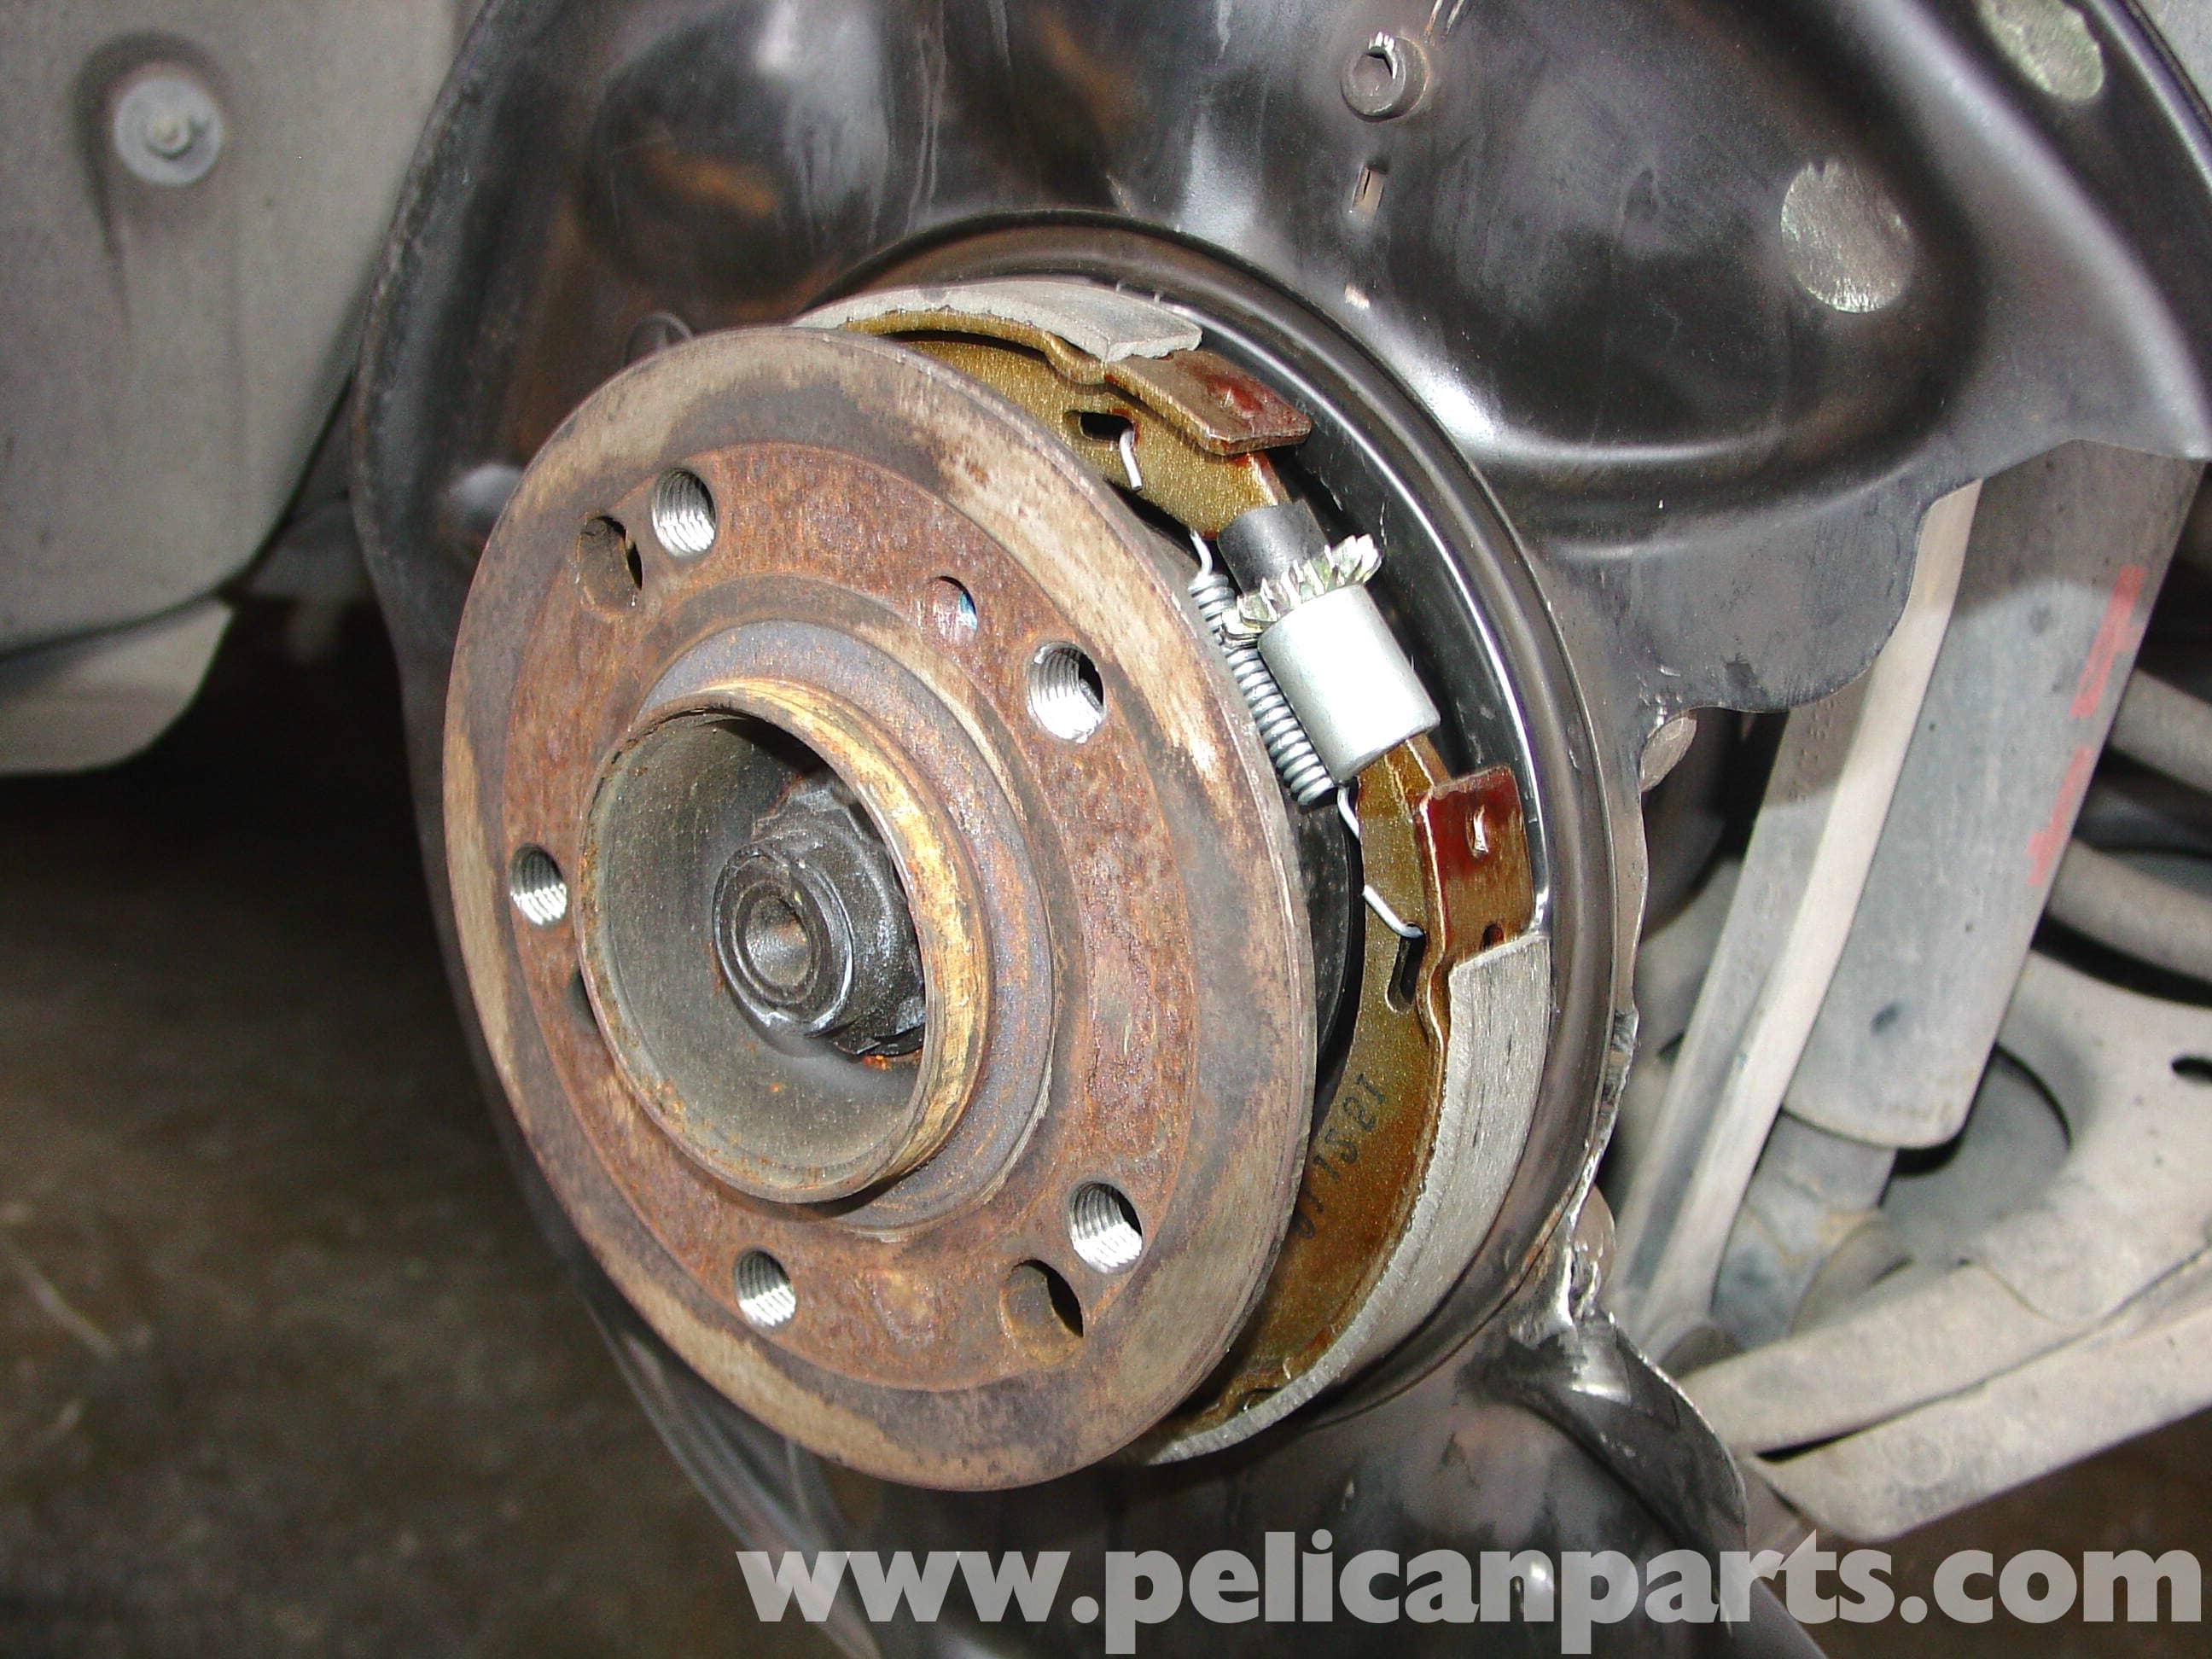 Mercedes benz w124 parking brake shoe replacement 1986 for Brake lining wear mercedes benz e320